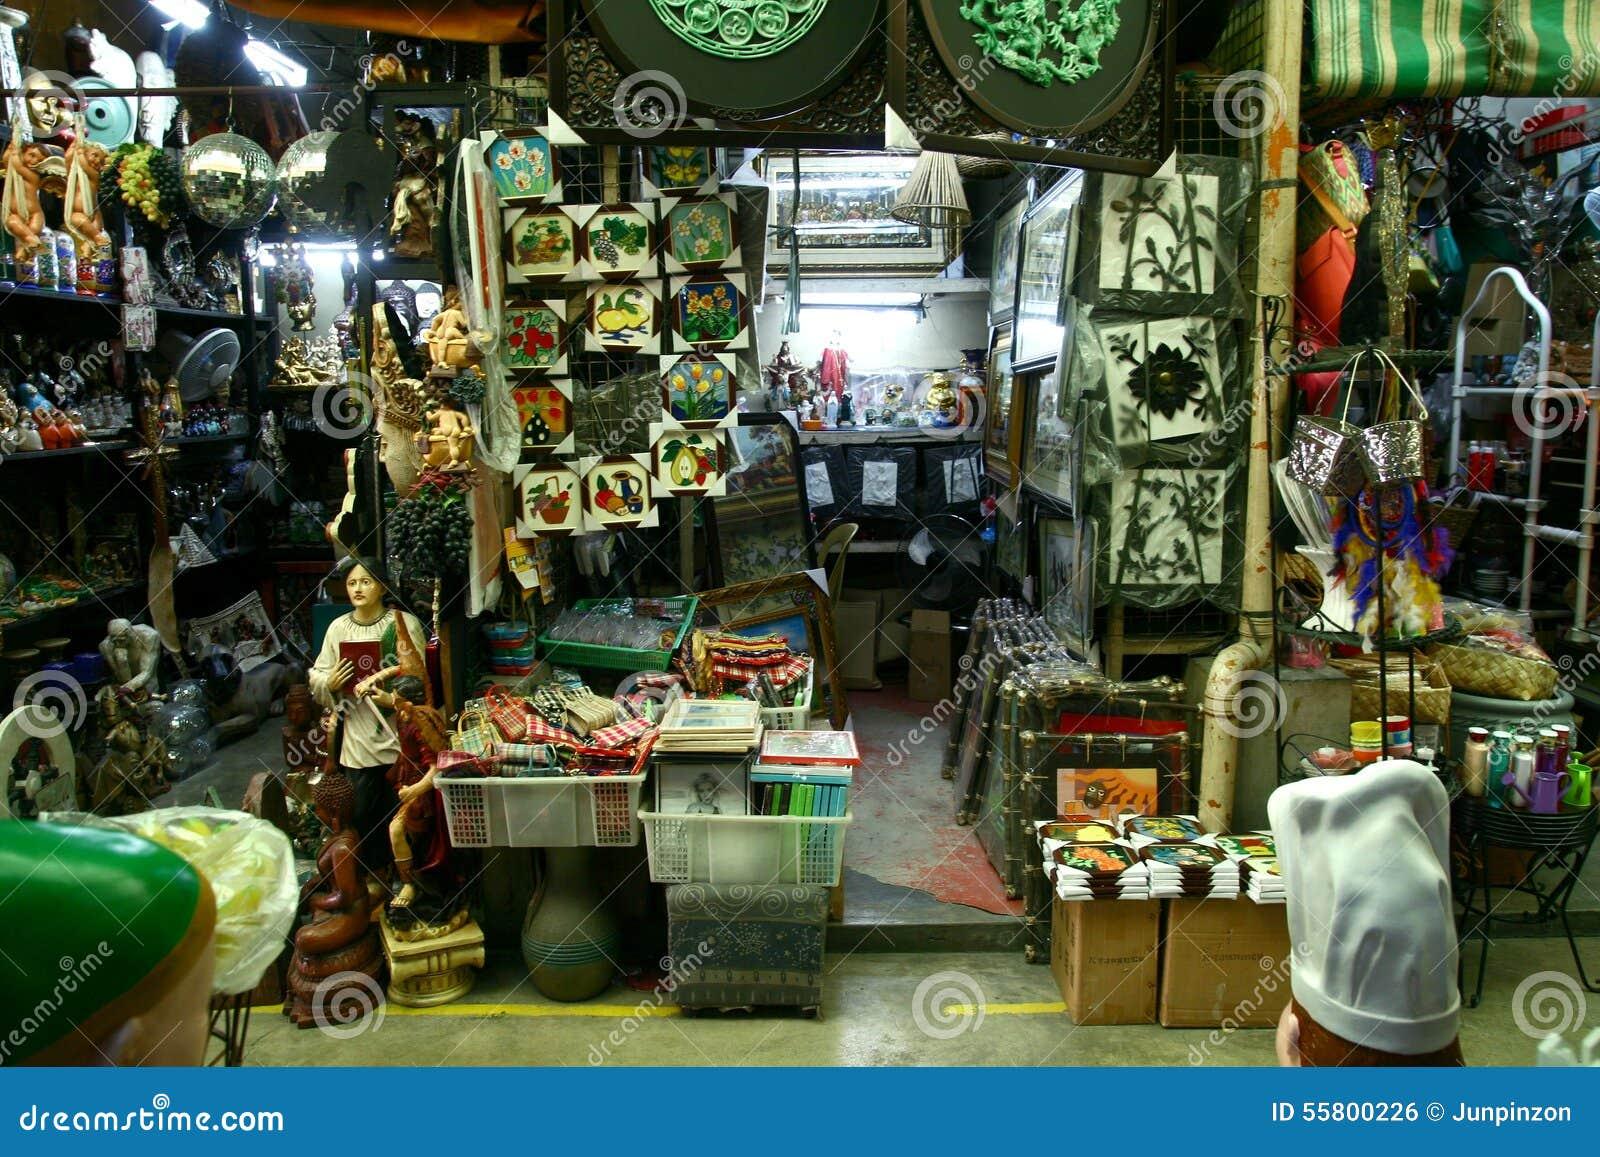 Flea Market Stores In Dapitan Arcade In Manila Philippines Selling Houseware And Home Decor